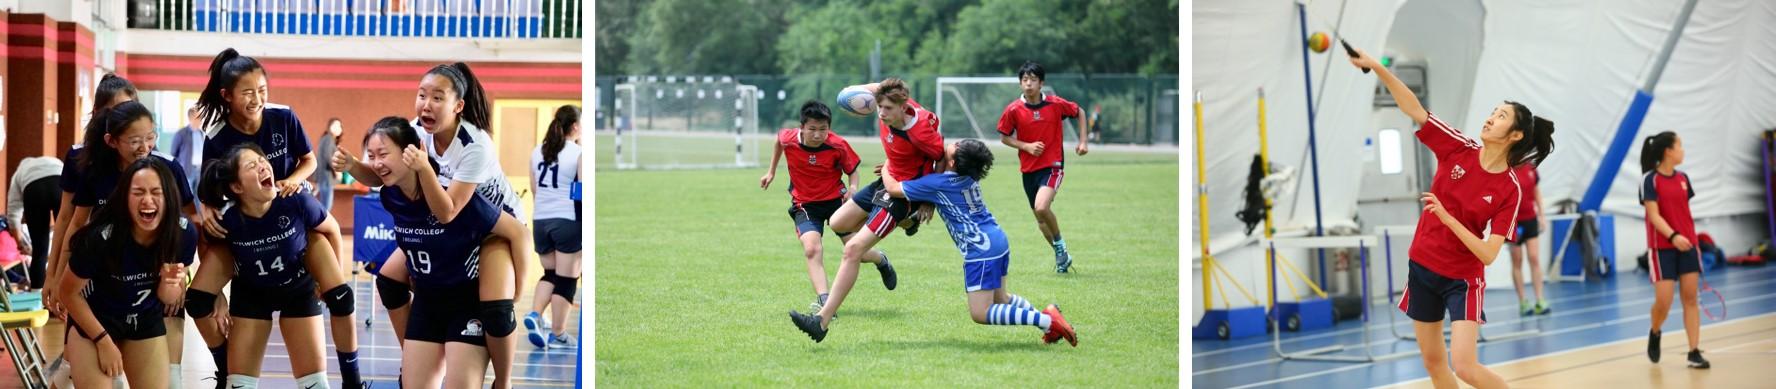 Senior School Sports